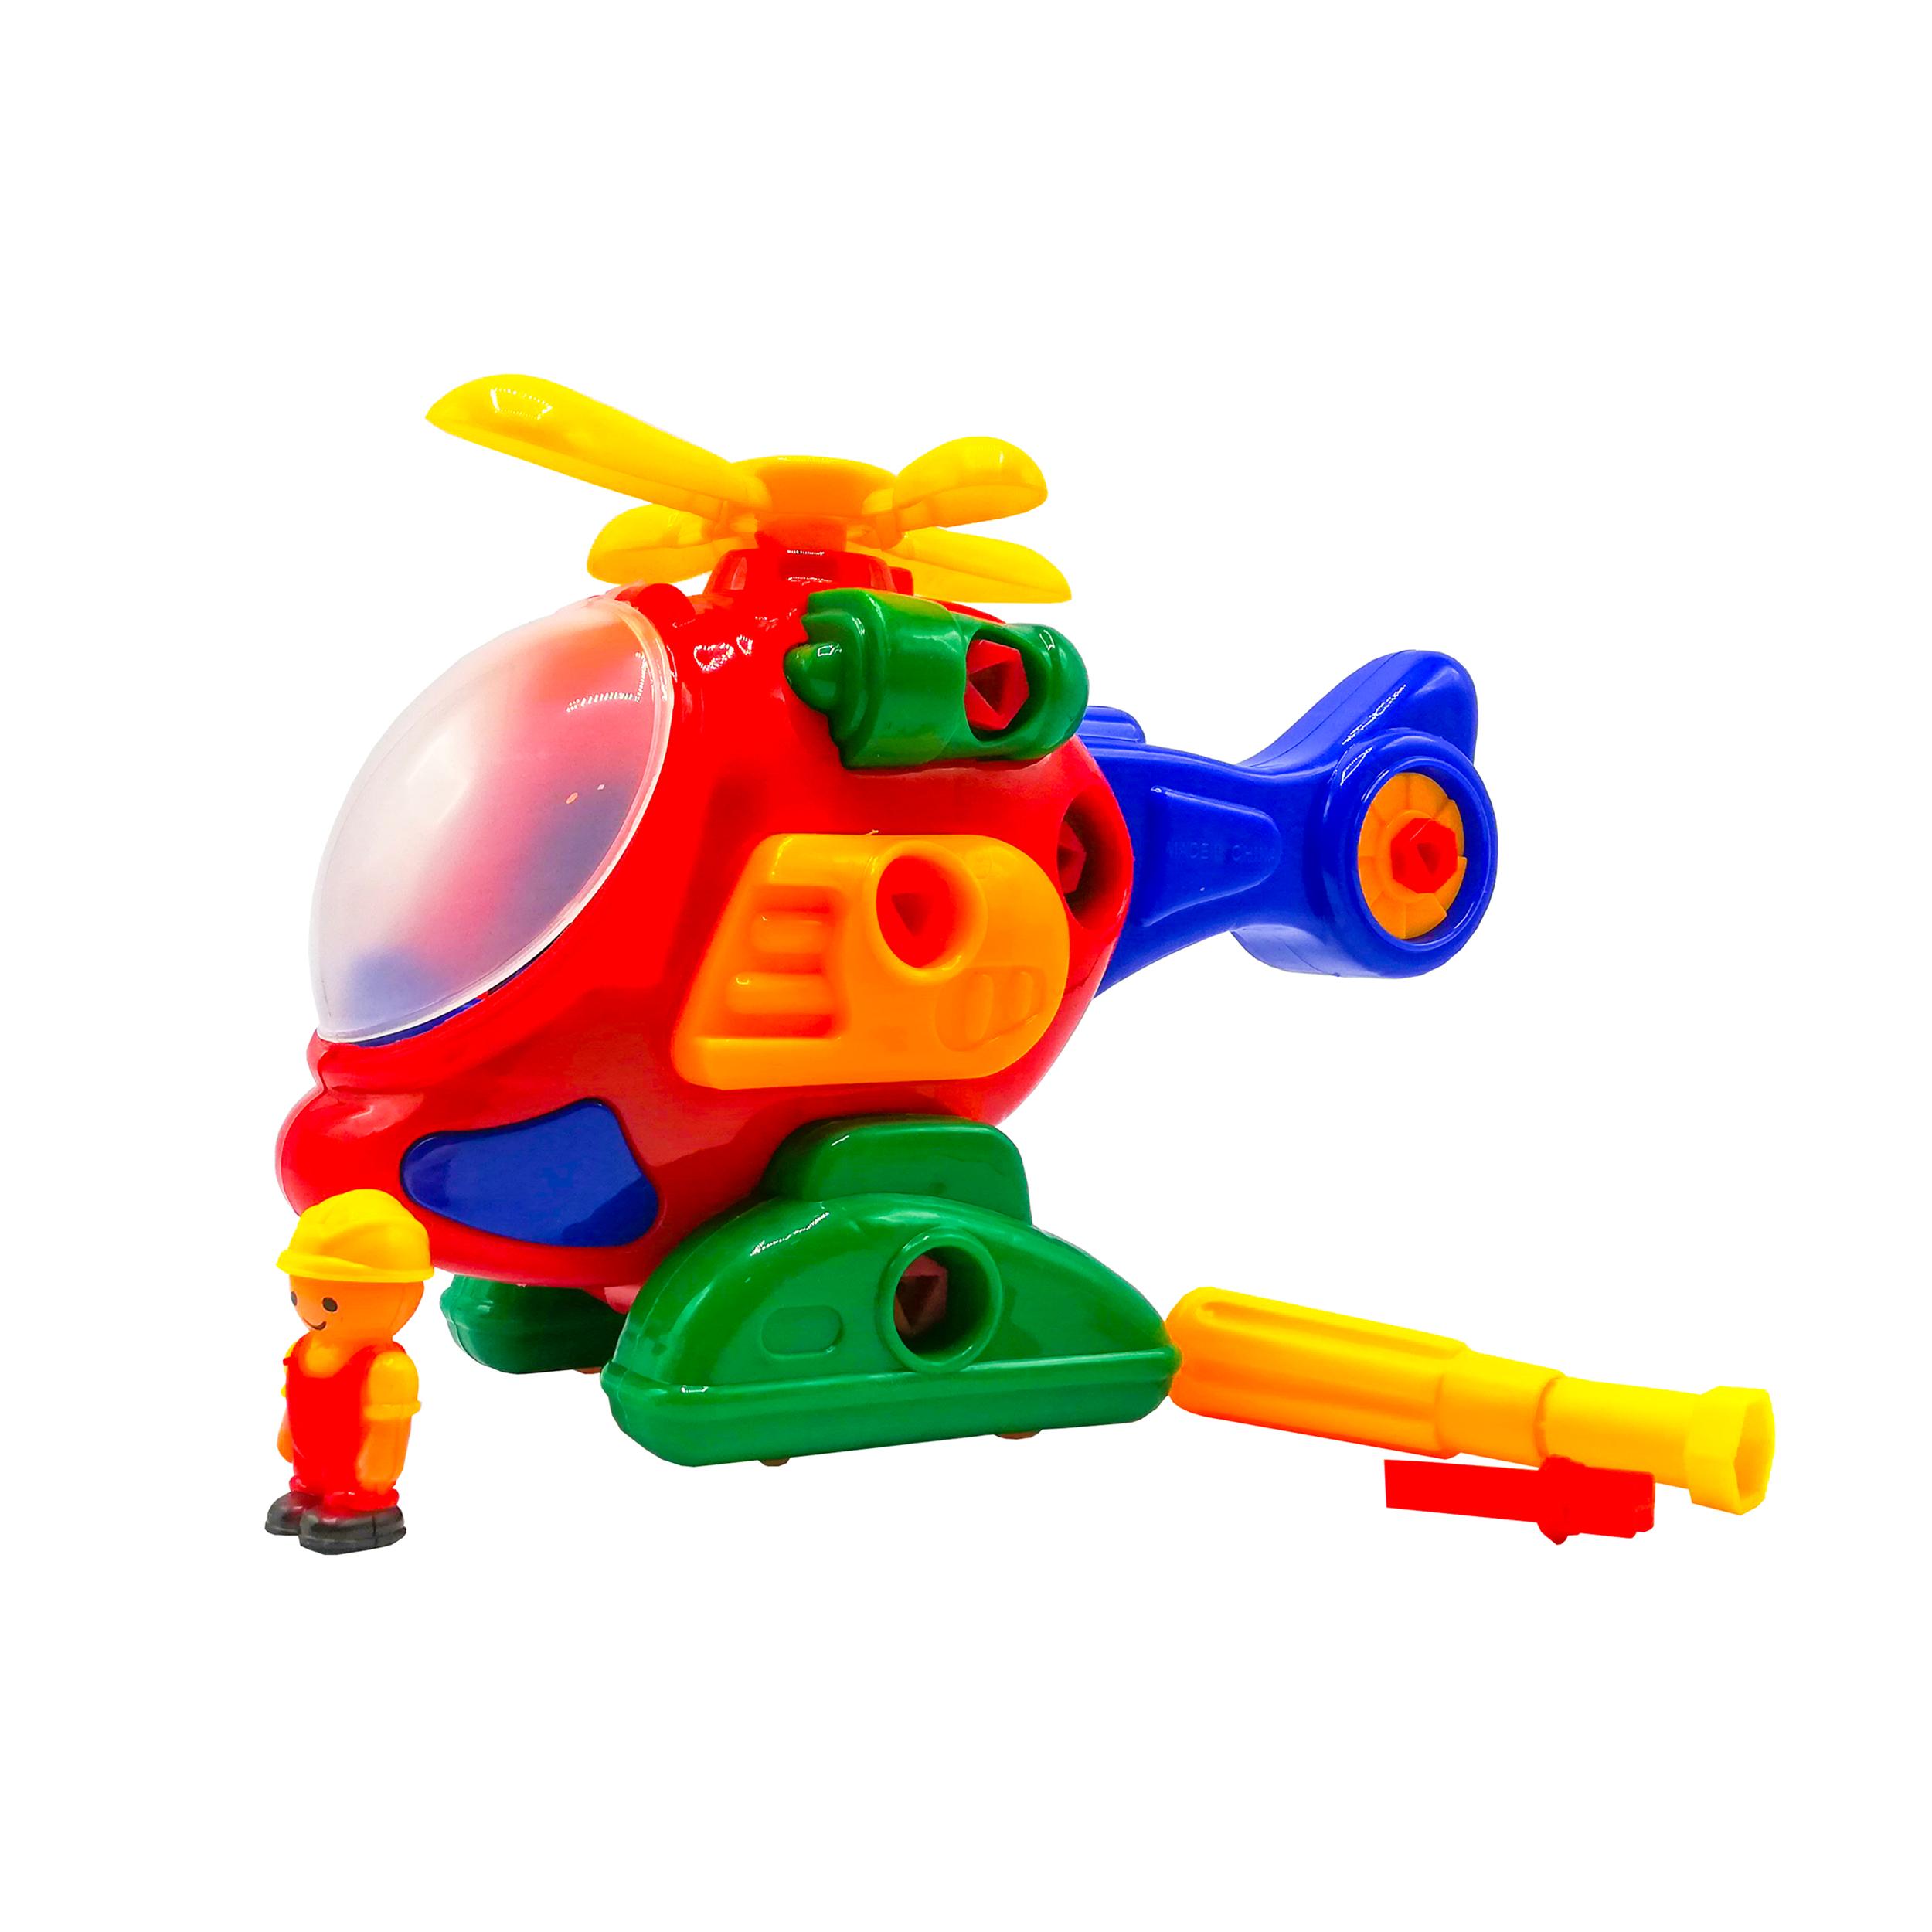 هواپیما و هلیکوپتر,هواپیما و هلیکوپتر گلدونه